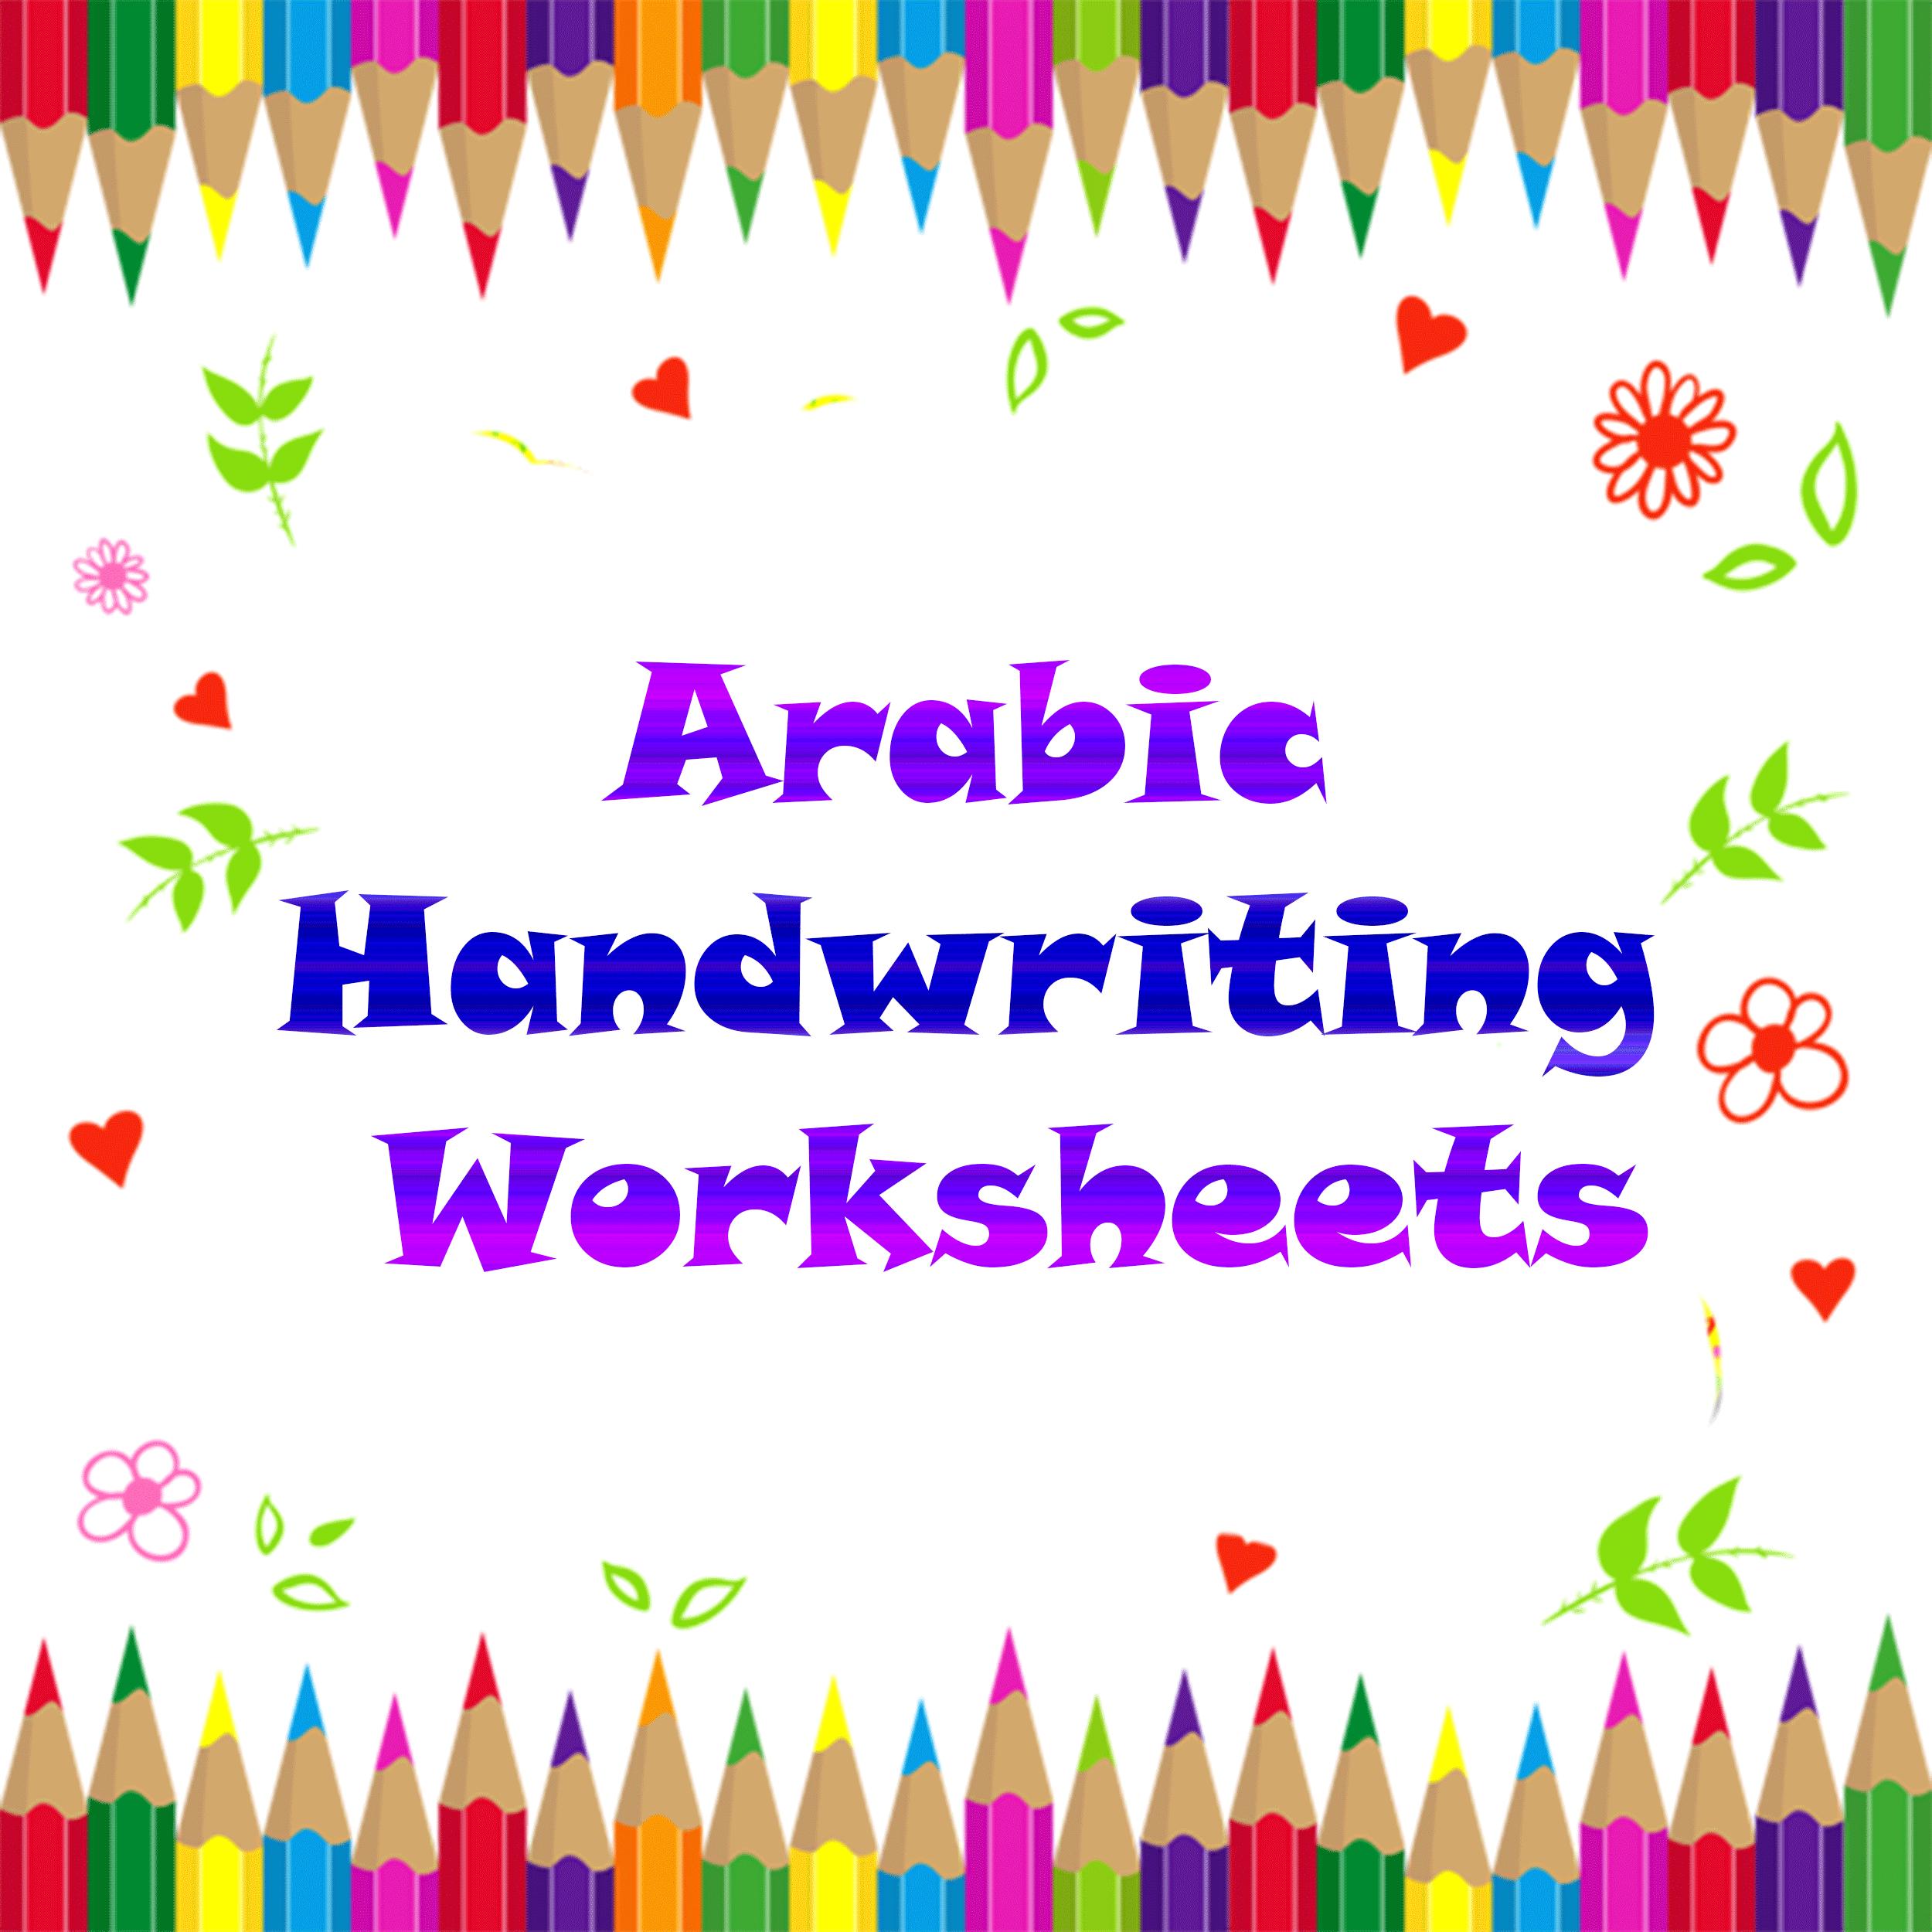 Arabic Handwriting Worksheets Download The Ebook S